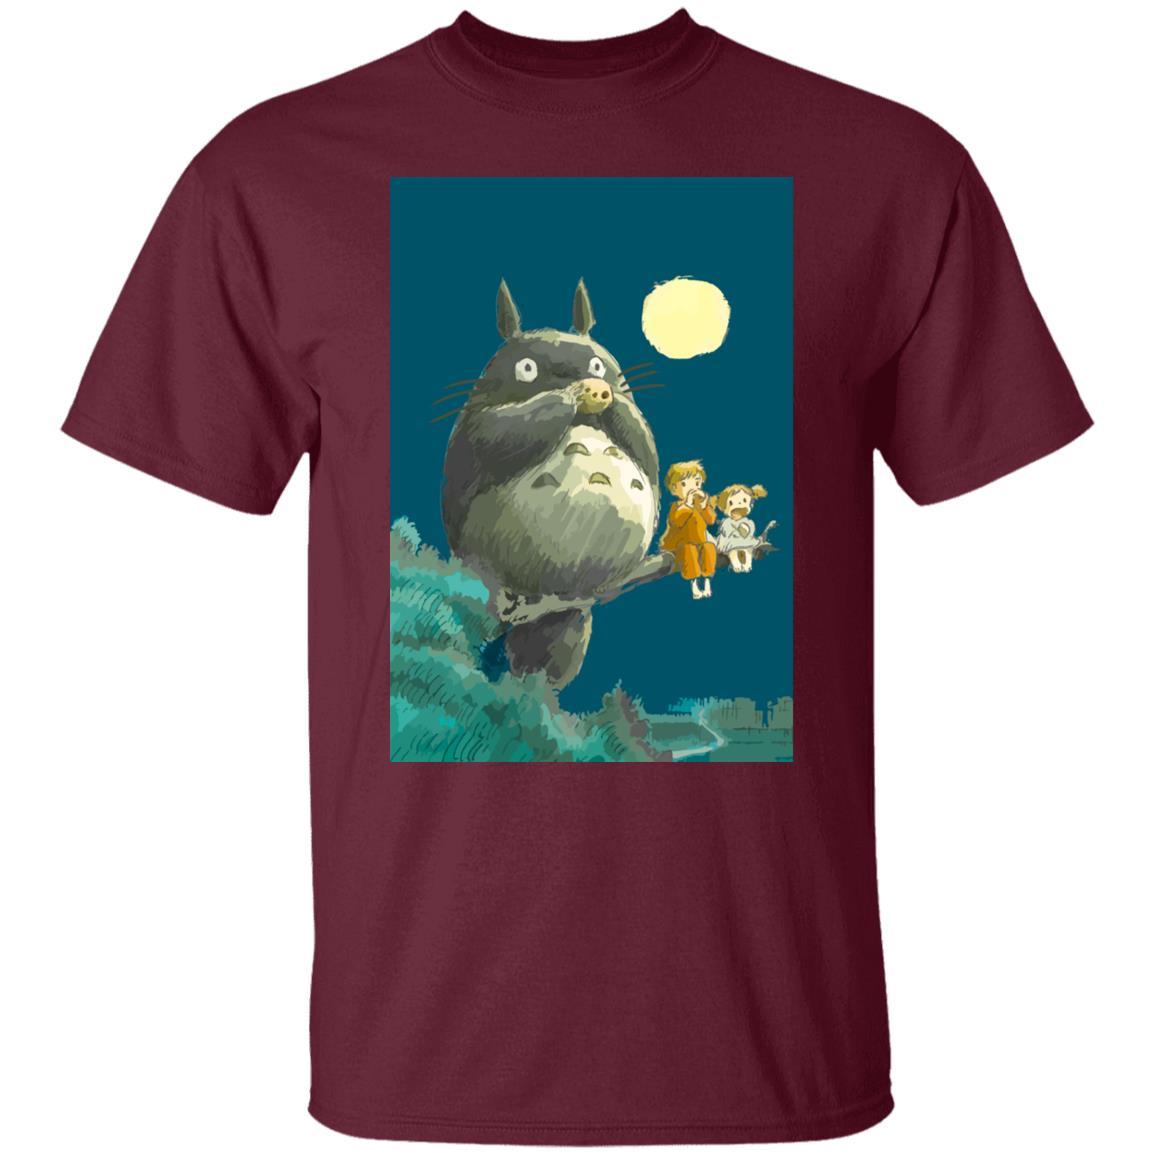 My Neighbor Totoro by the moon T shirt Unisex